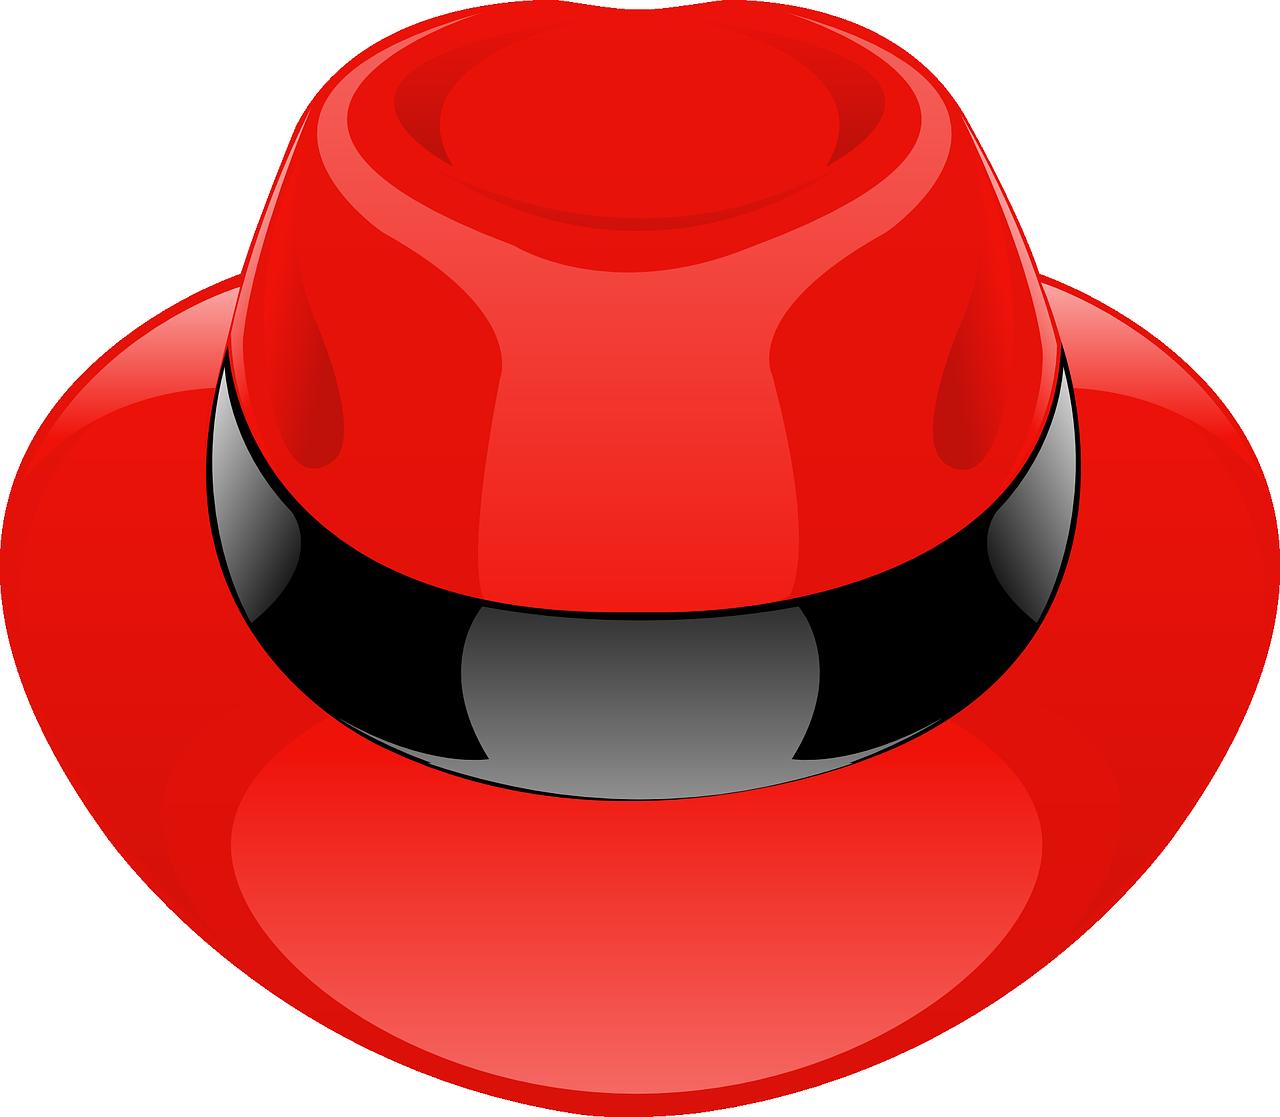 fedora clipart alpine hat